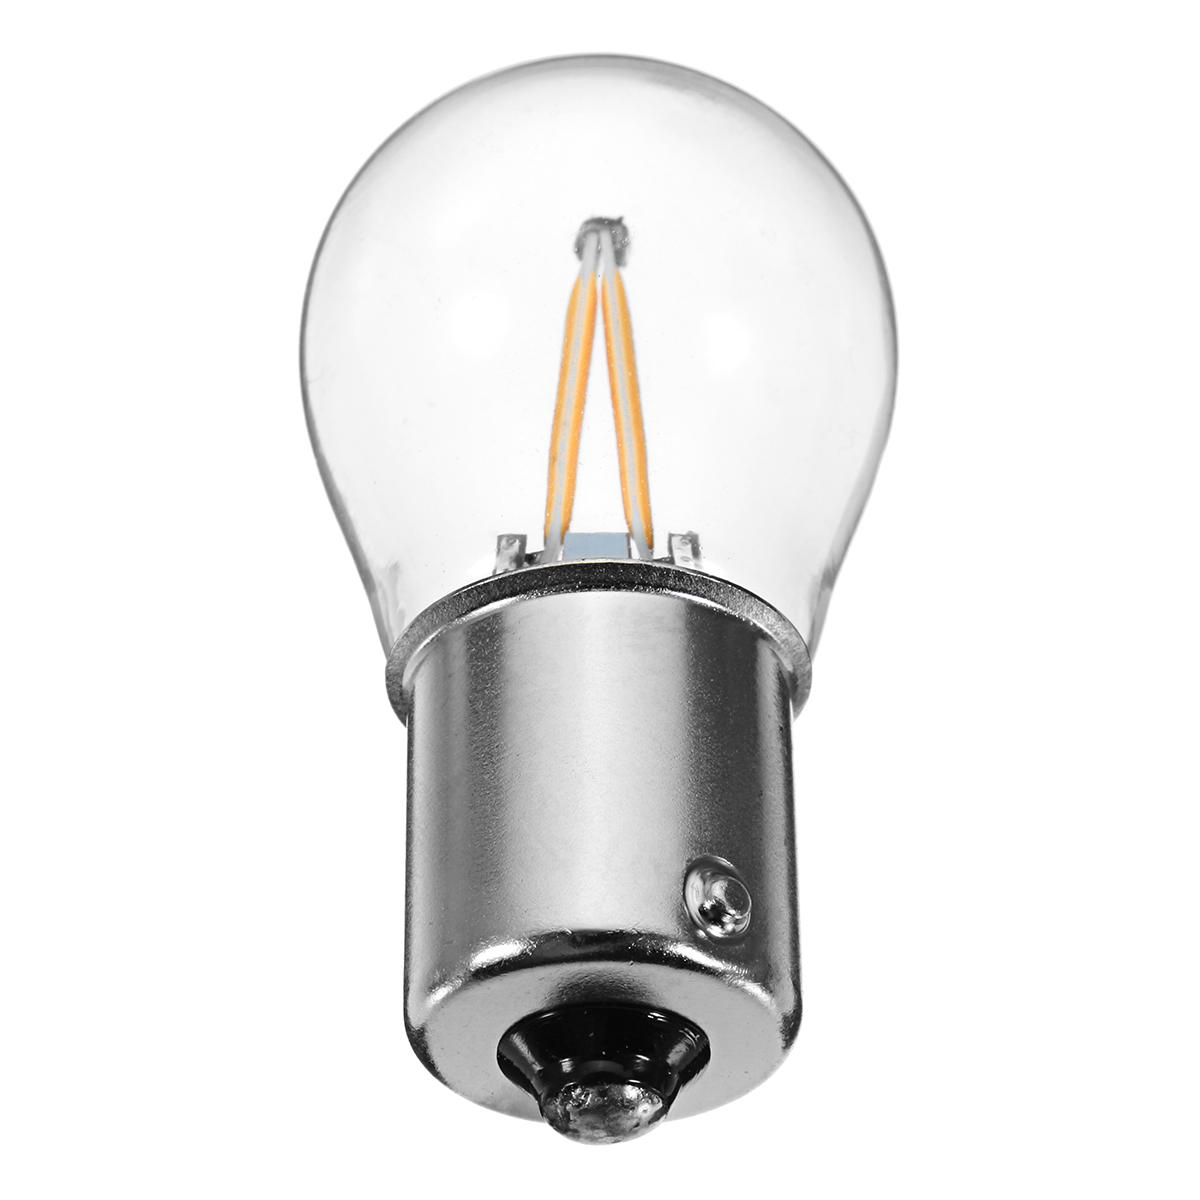 2.5W 28V 200LM Car COB LED Indicator Light Backup Light ...